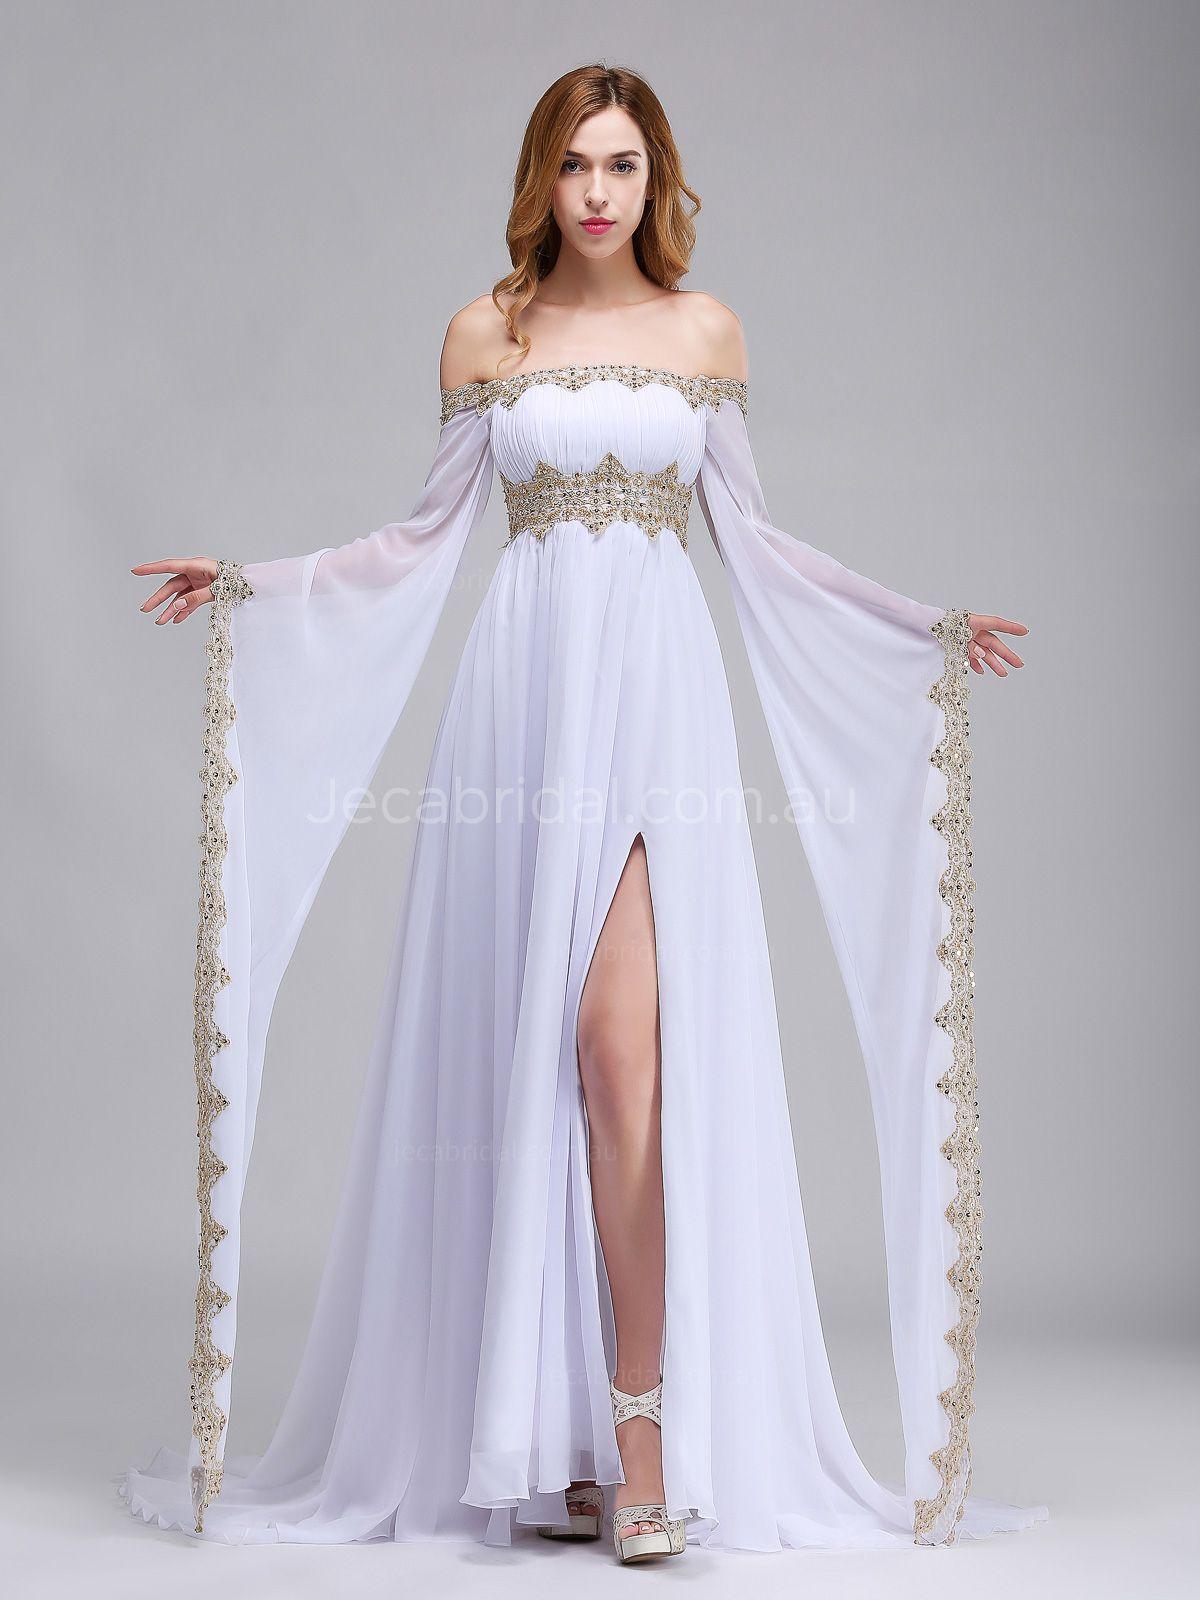 elvish wedding dresses photo - 1